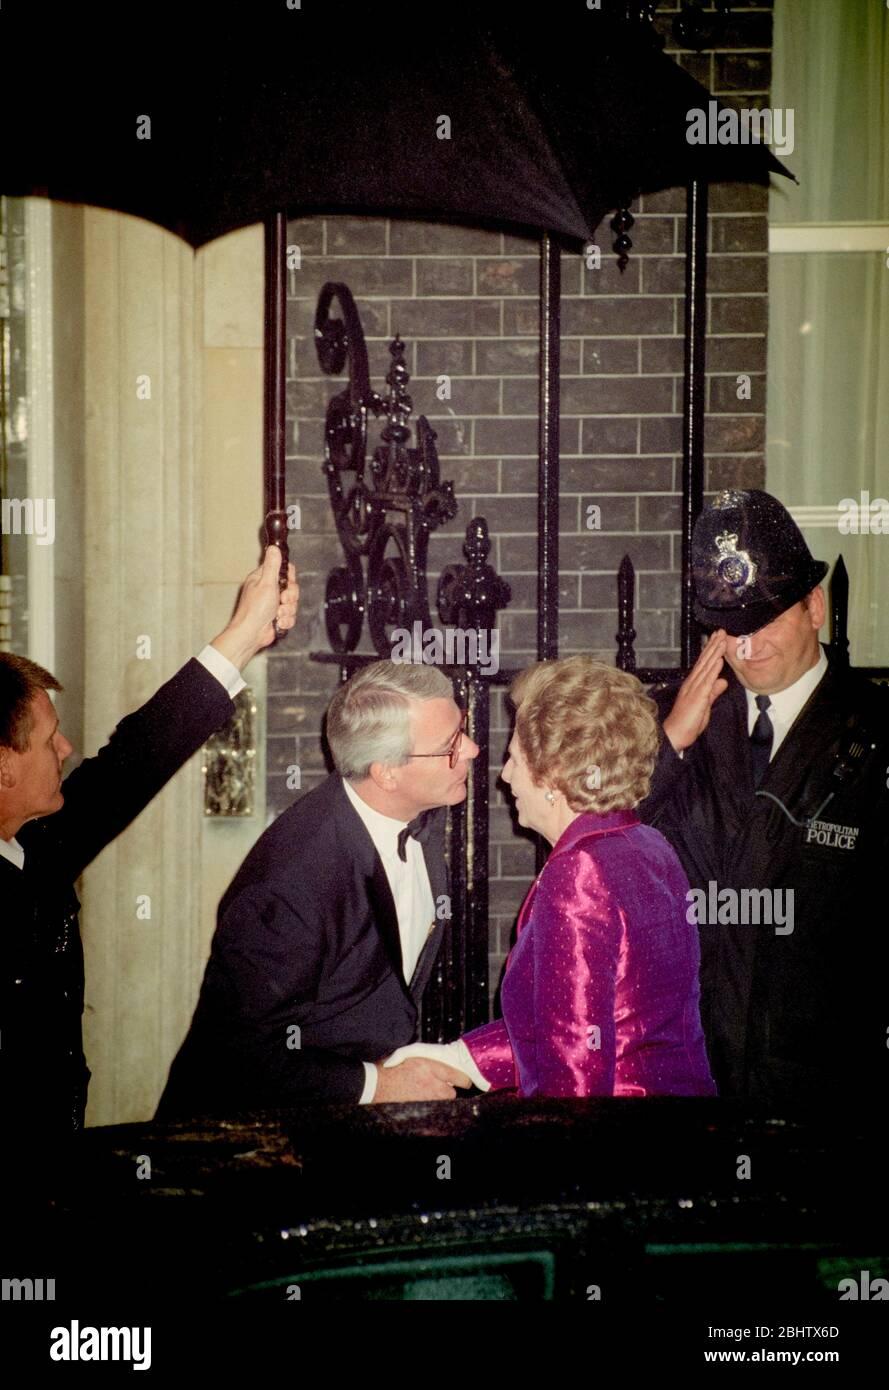 Prime Minister John Major and Margaret Thatcher, Baroness Thatcher, outside the door of 10 Downing Street, London, UK on 26th September 1995. Stock Photo